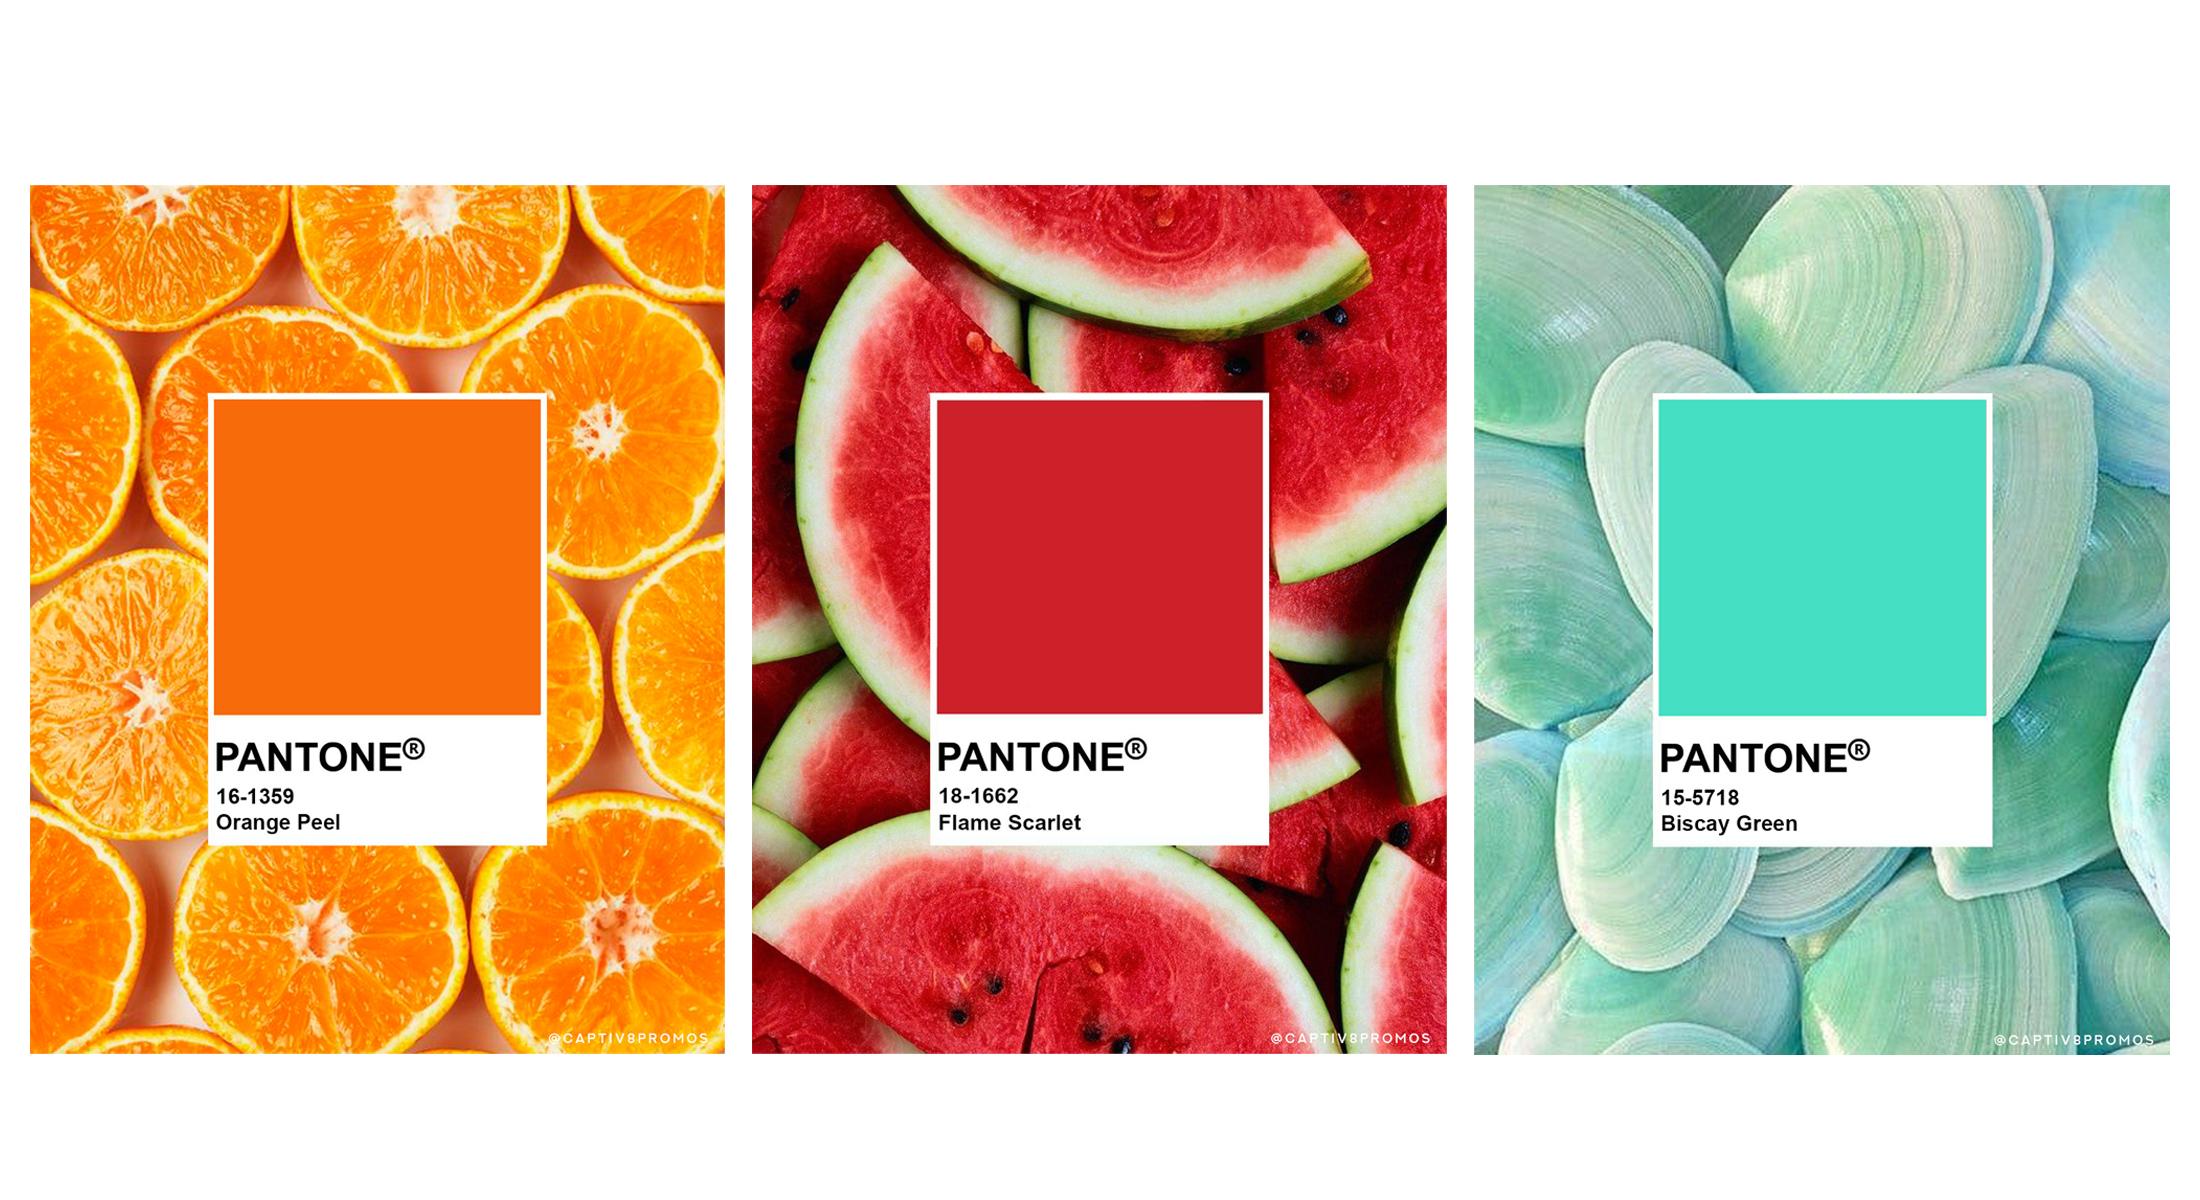 Pantone's Spring/Summer 2020 Color Palette